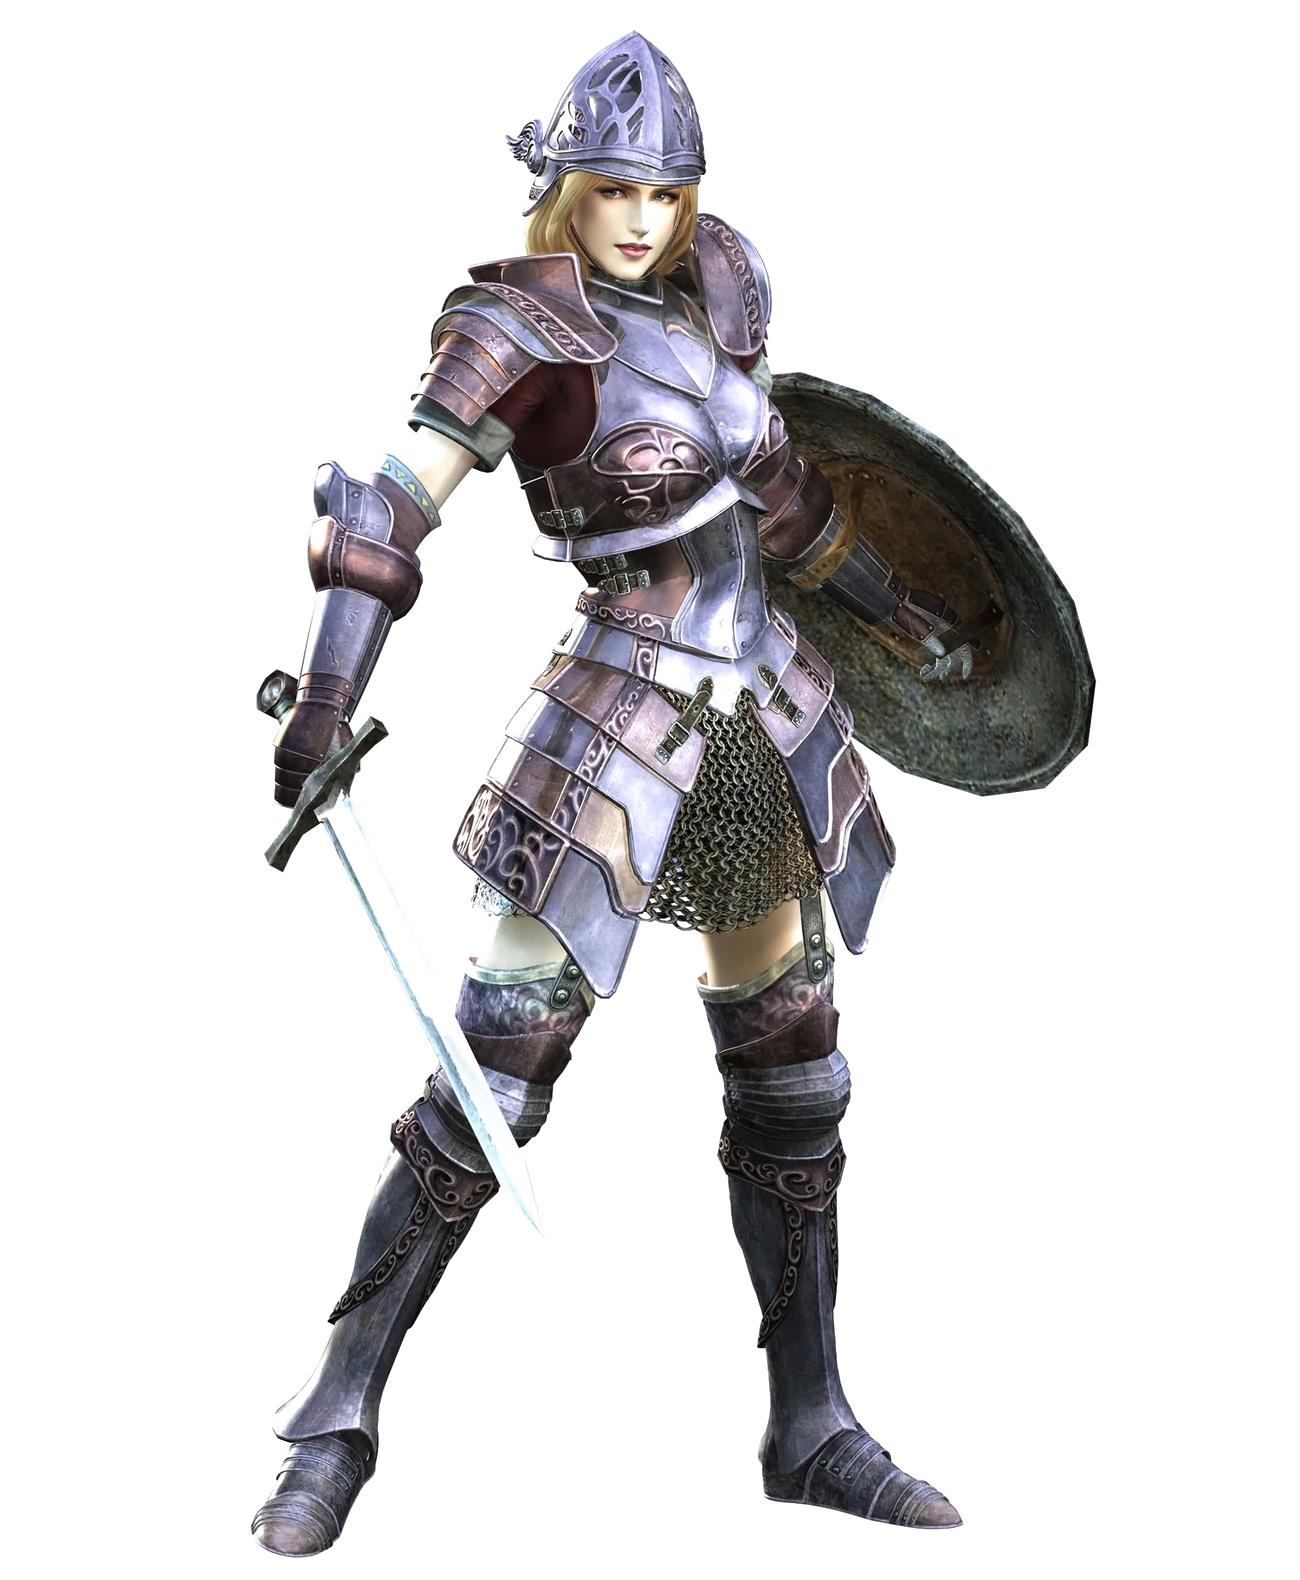 Warriors Orochi 3 Ultimate Multi Attribute: Image - Female Protagonist 1 (BS).jpg